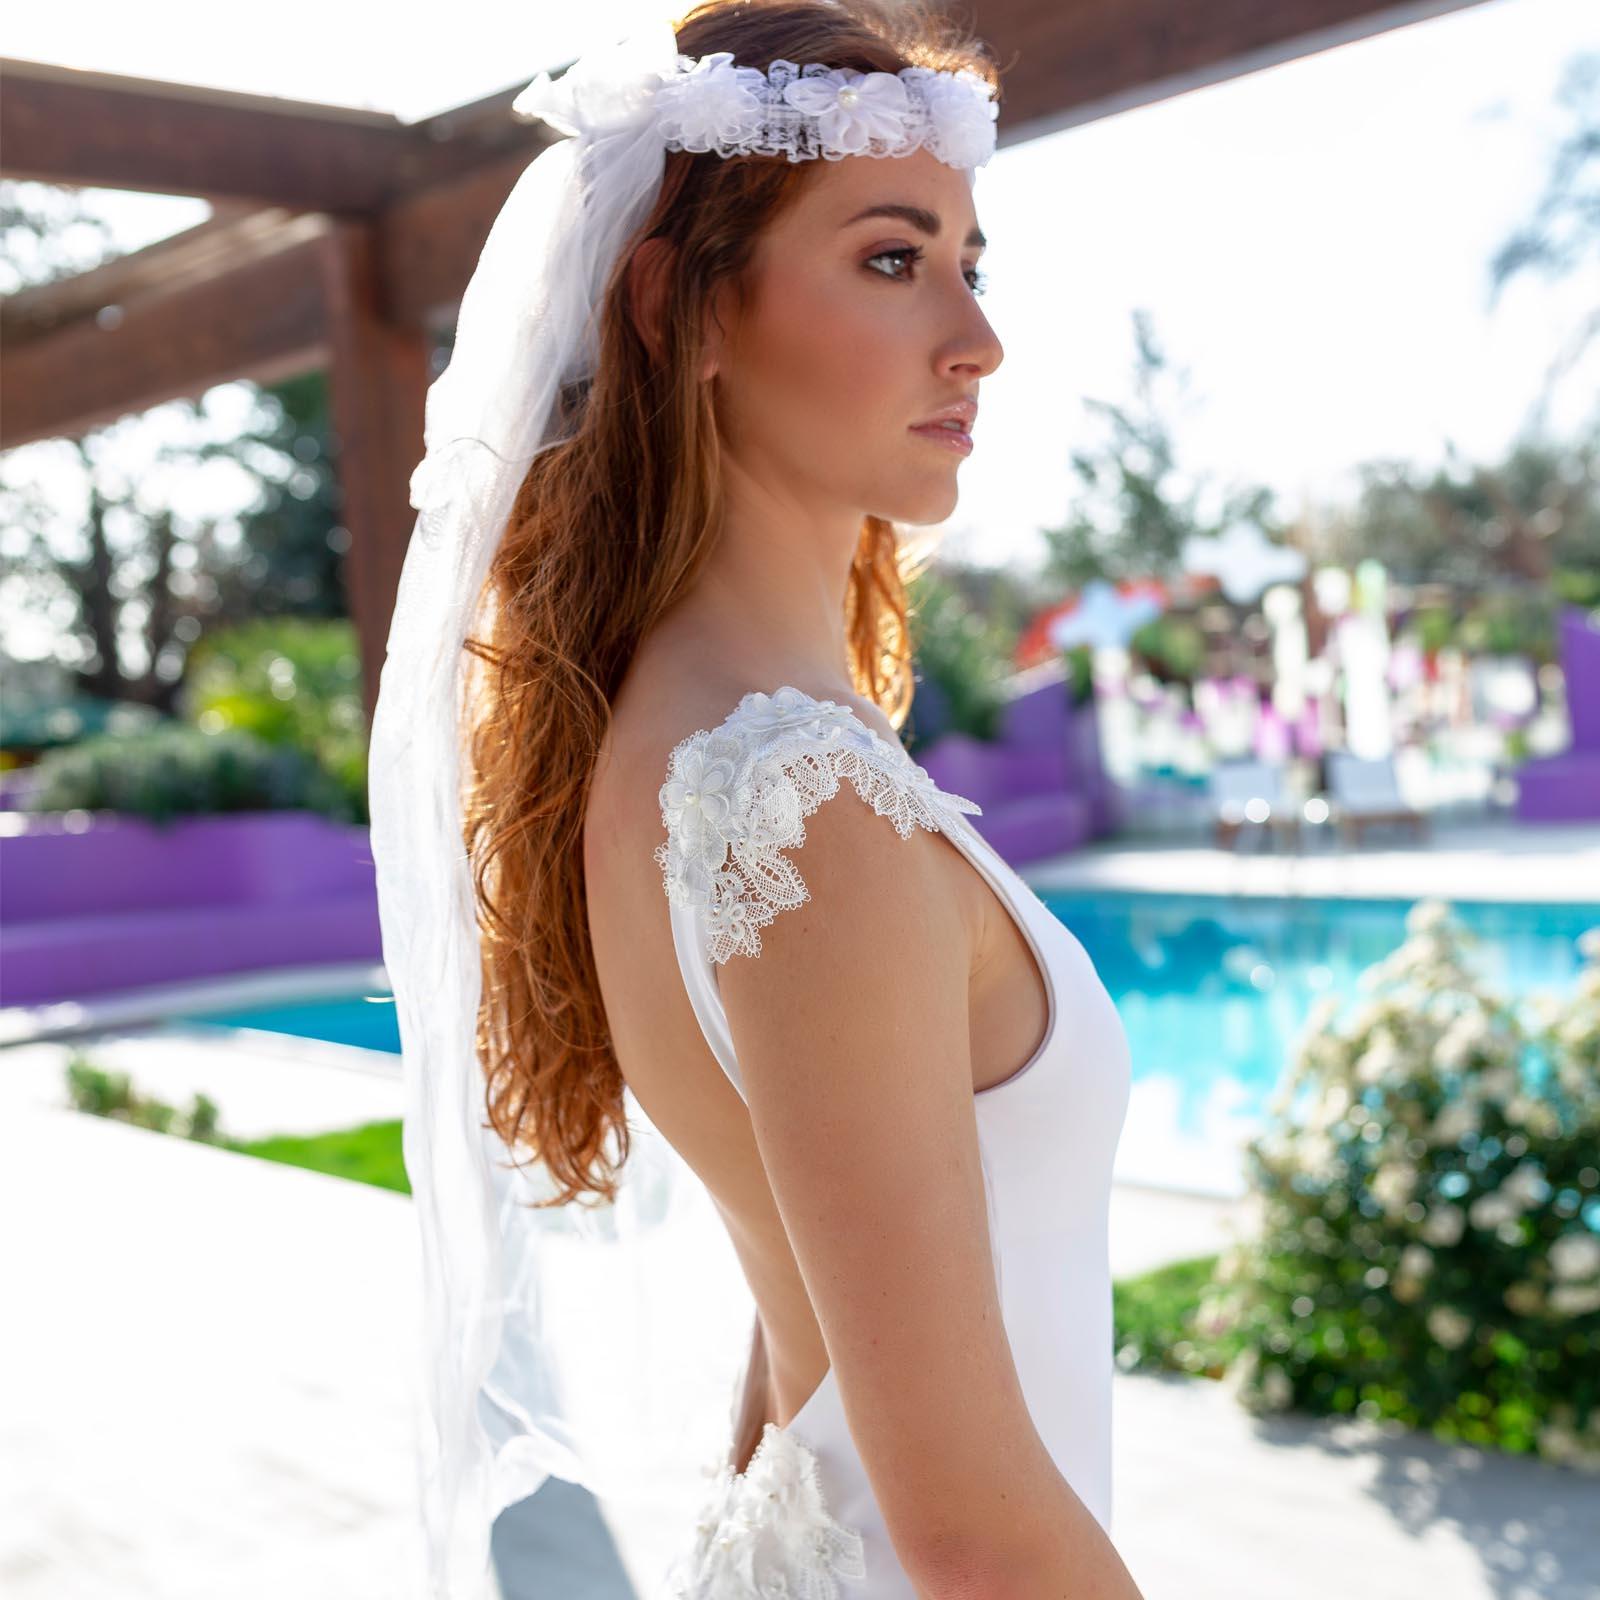 Kinda 3D Swimwear Reina white swimsuit bikini bianco con pizzo with lace addio al nubilato hens party